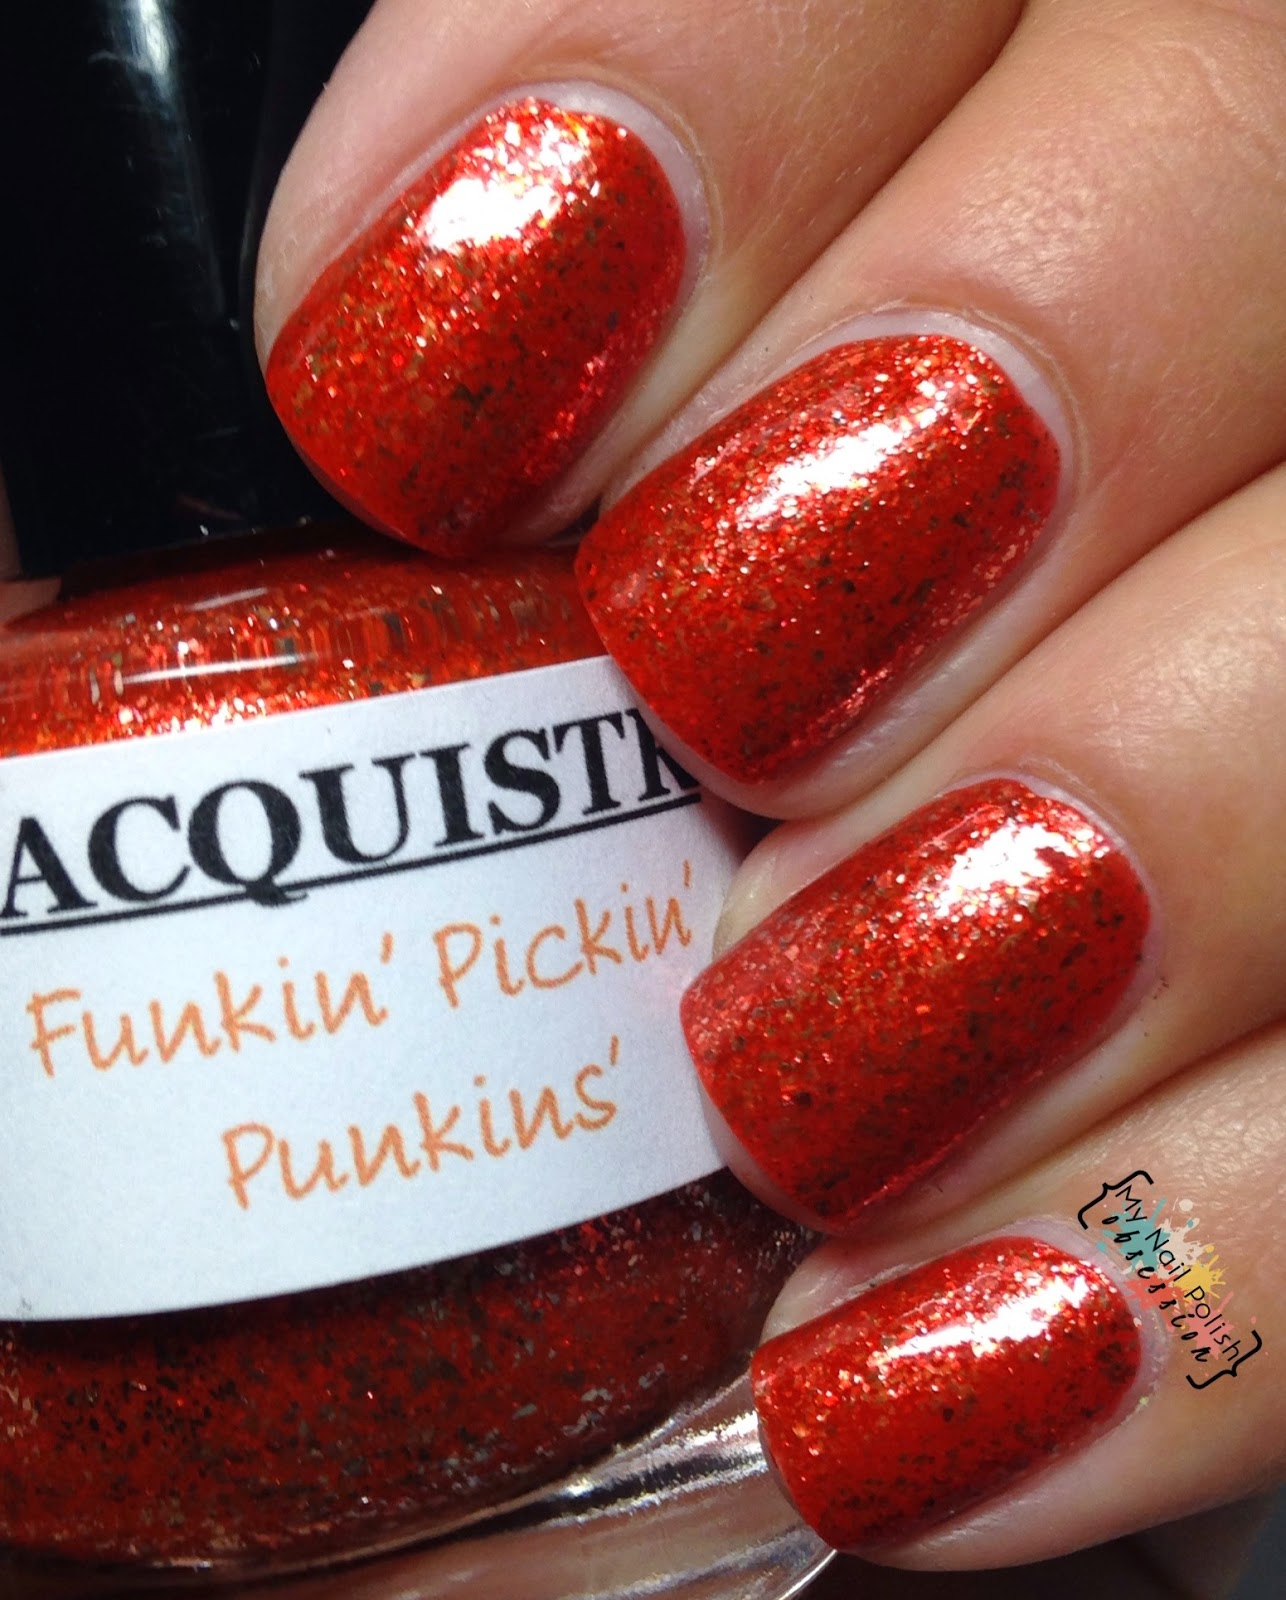 Lacquistry Funkin' Pickin' Punkins'